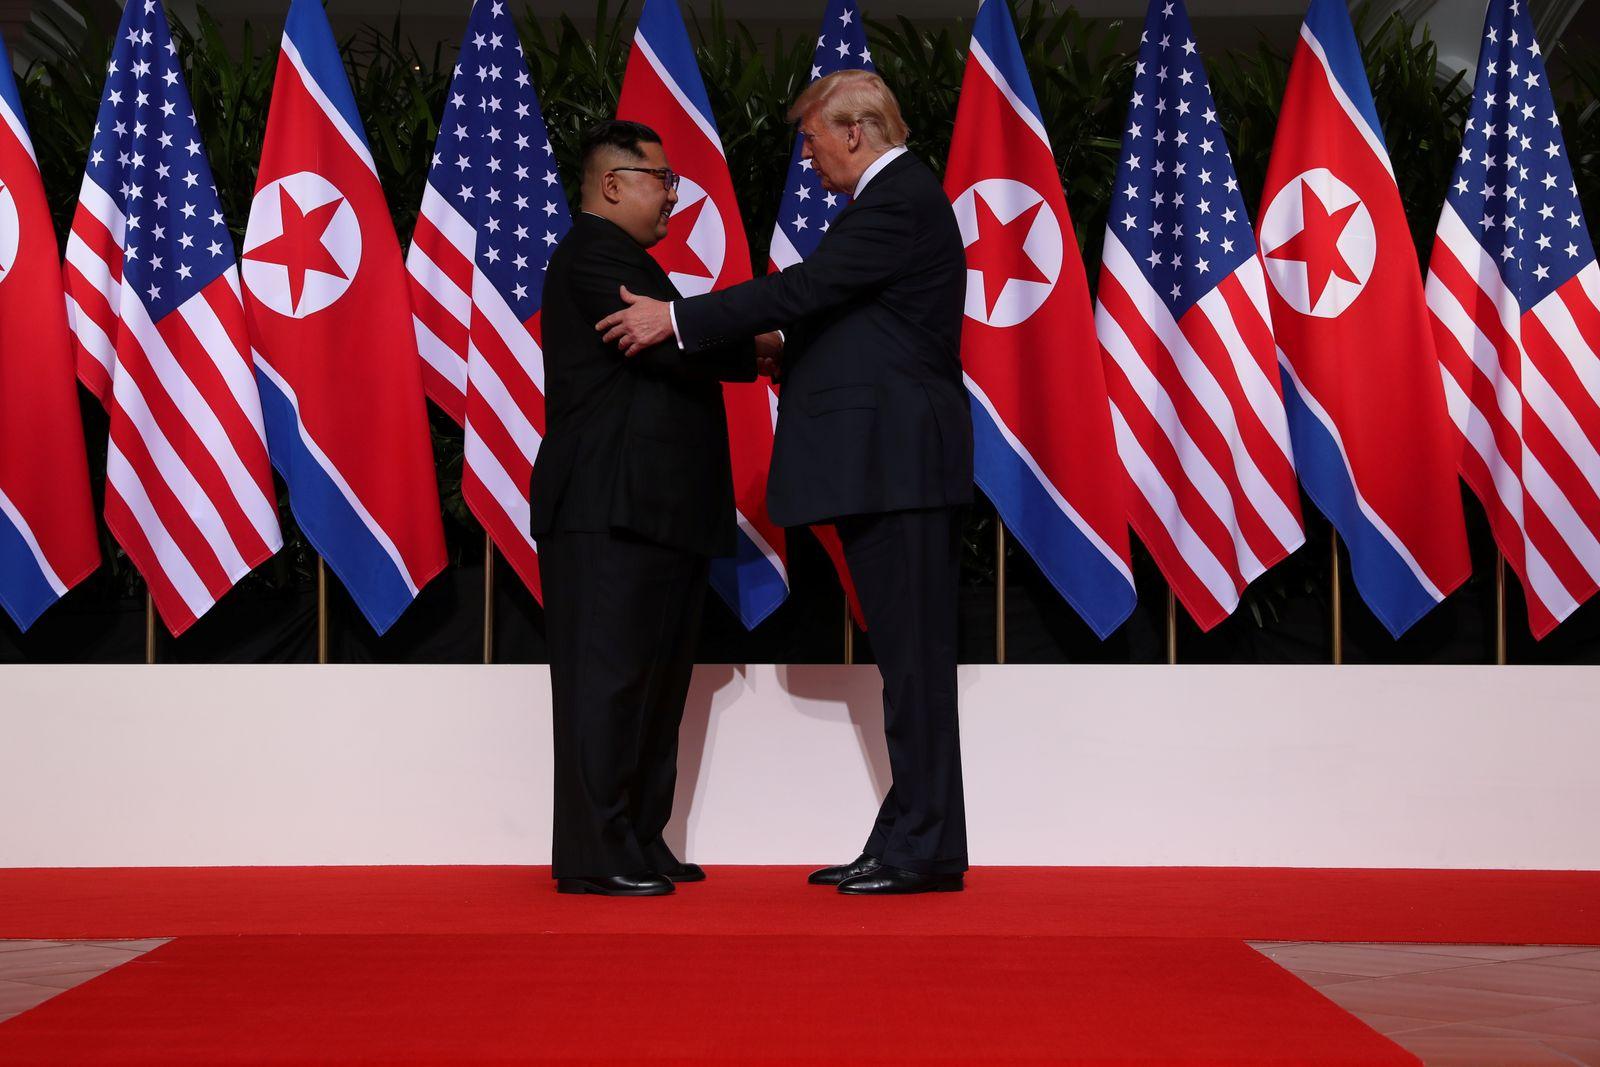 Kim Jong Un / Donald Trump / Arm